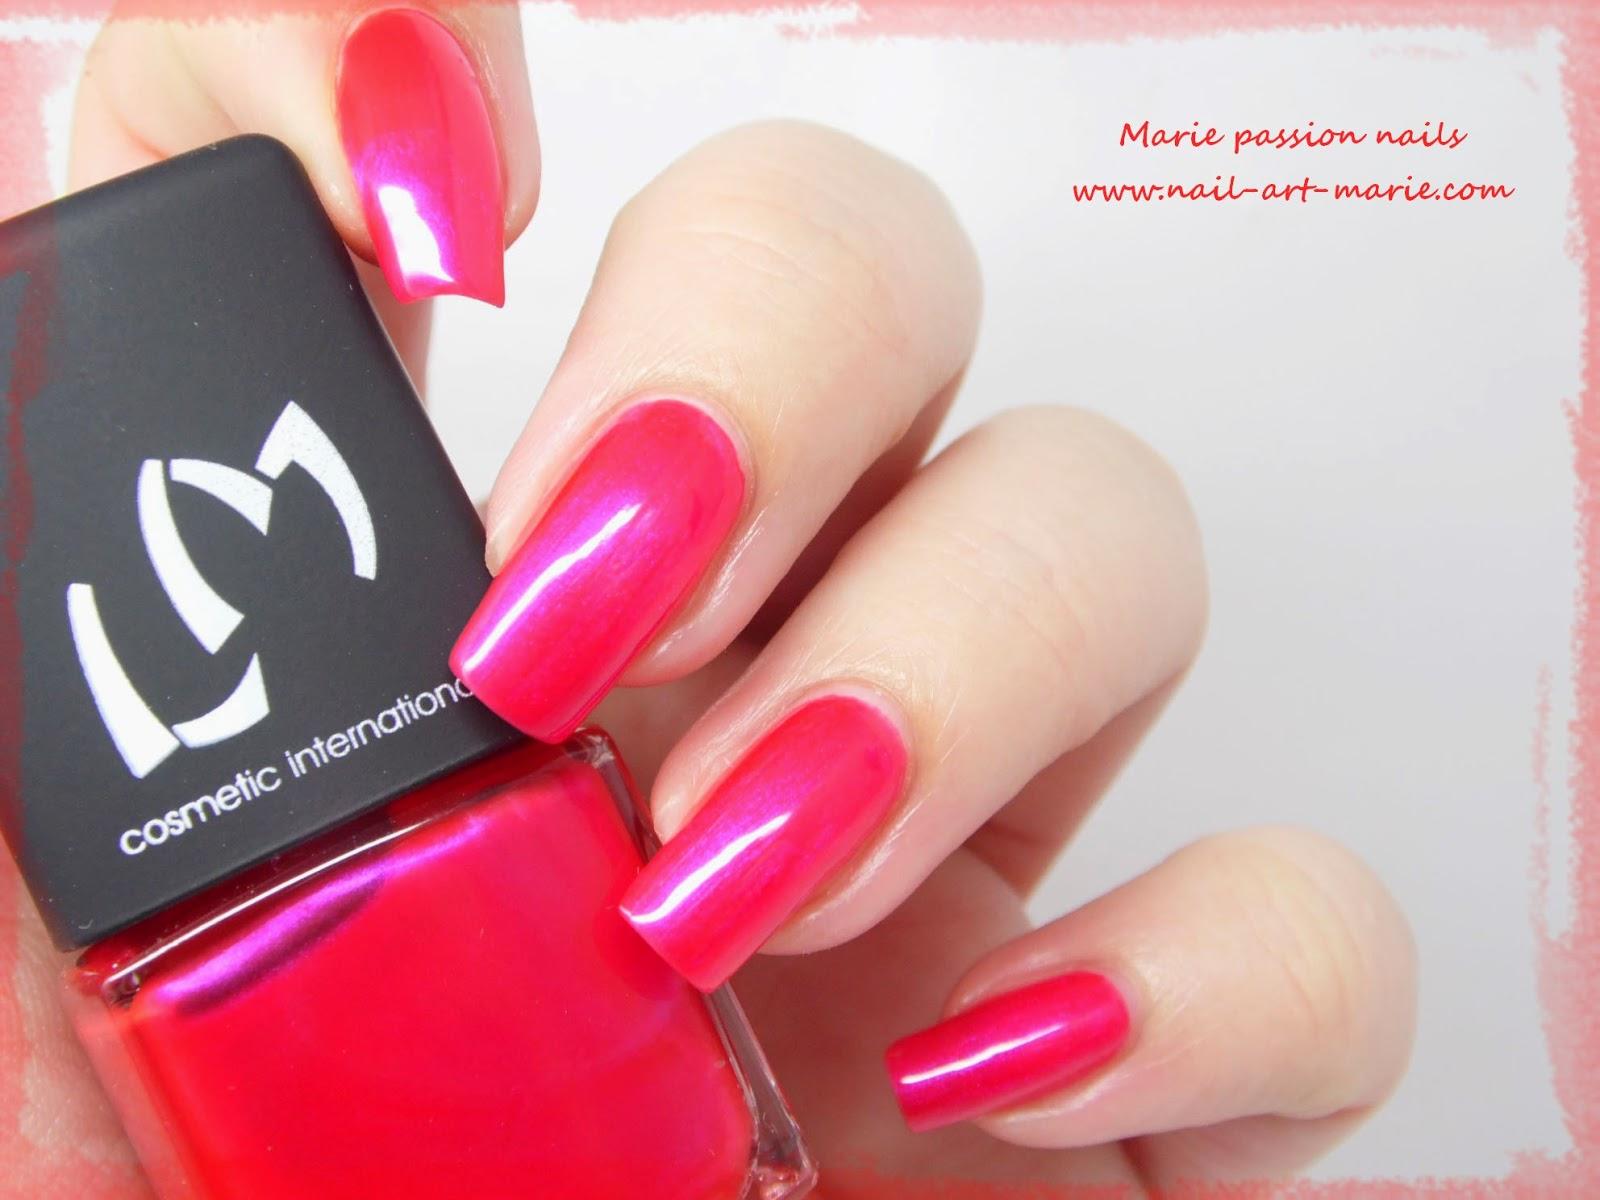 LM Cosmetic Maracana8